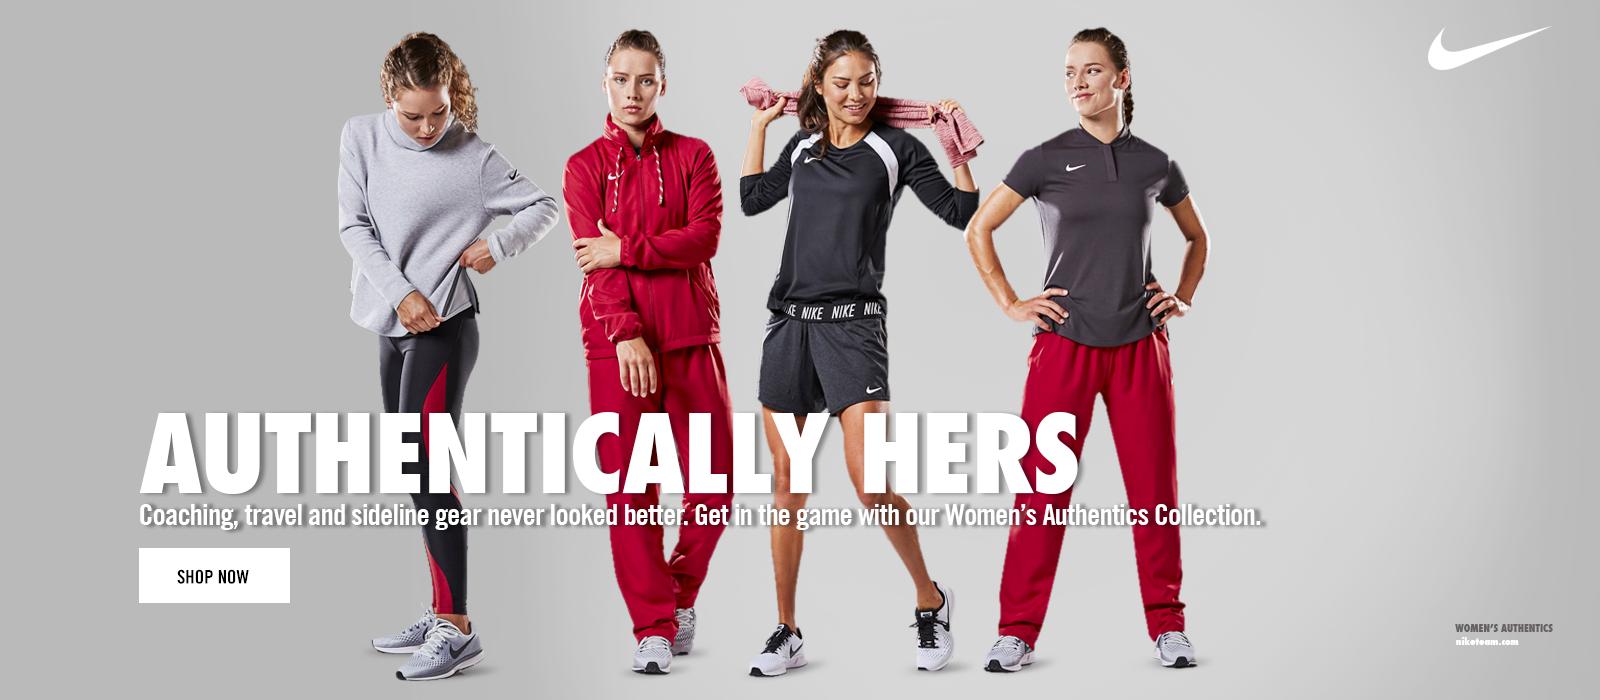 e84a15f84db5 Custom Nike Uniforms - Nike Team Sports